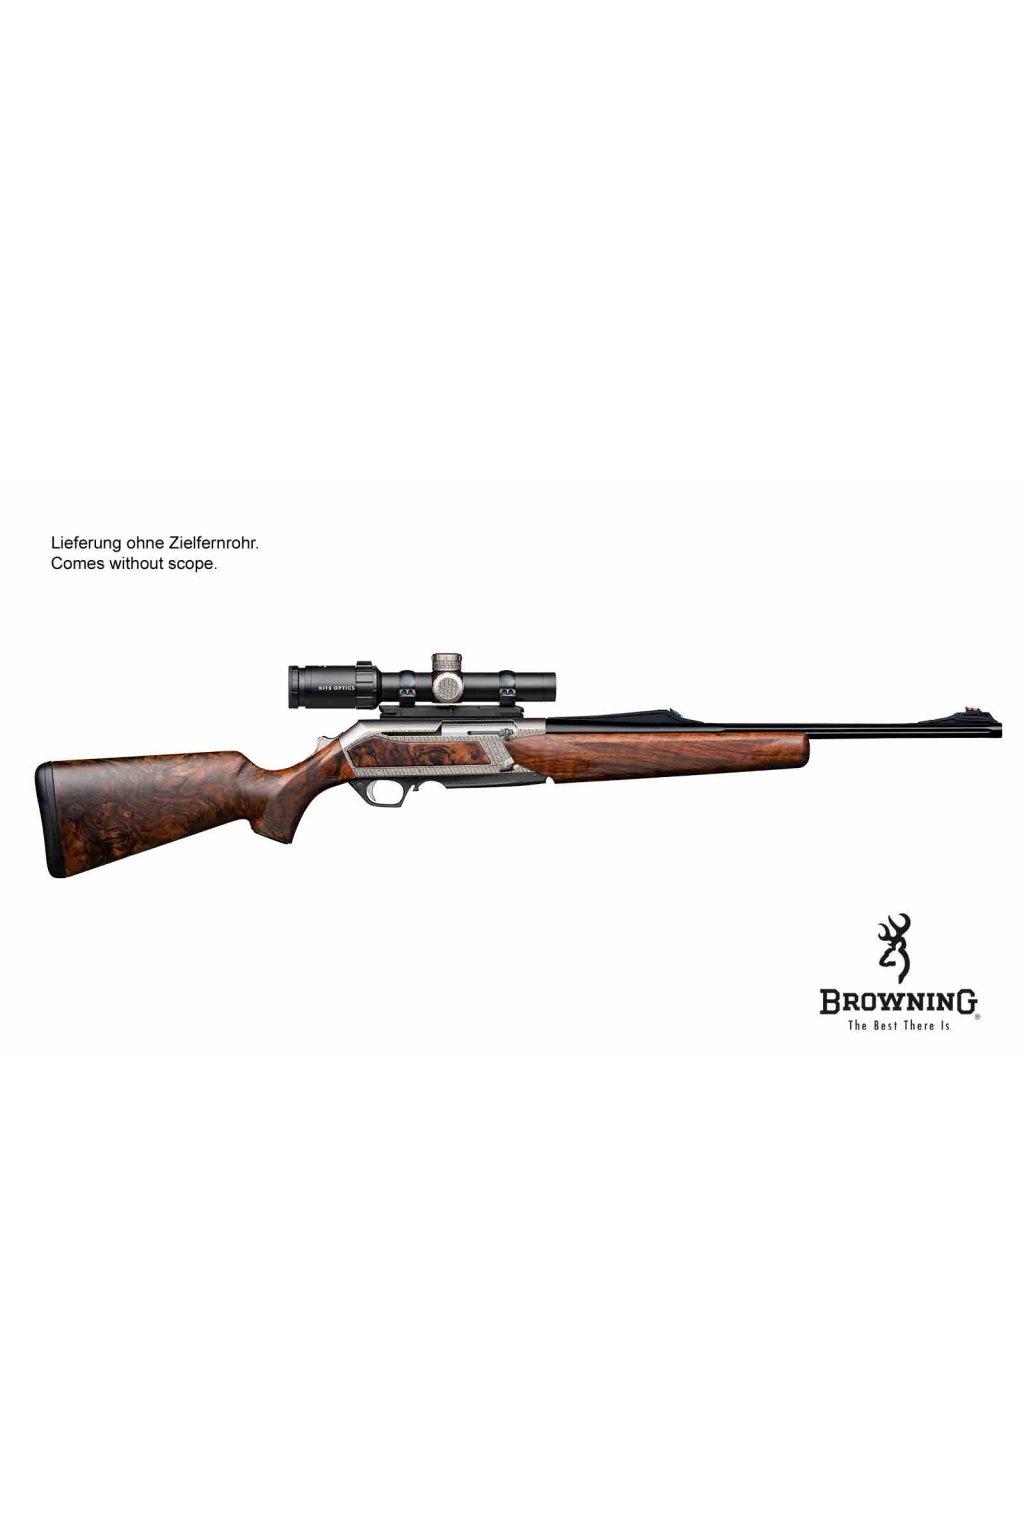 BROWNING MARAL PLATINUM M14X1 RÁŽE 30 06 SP